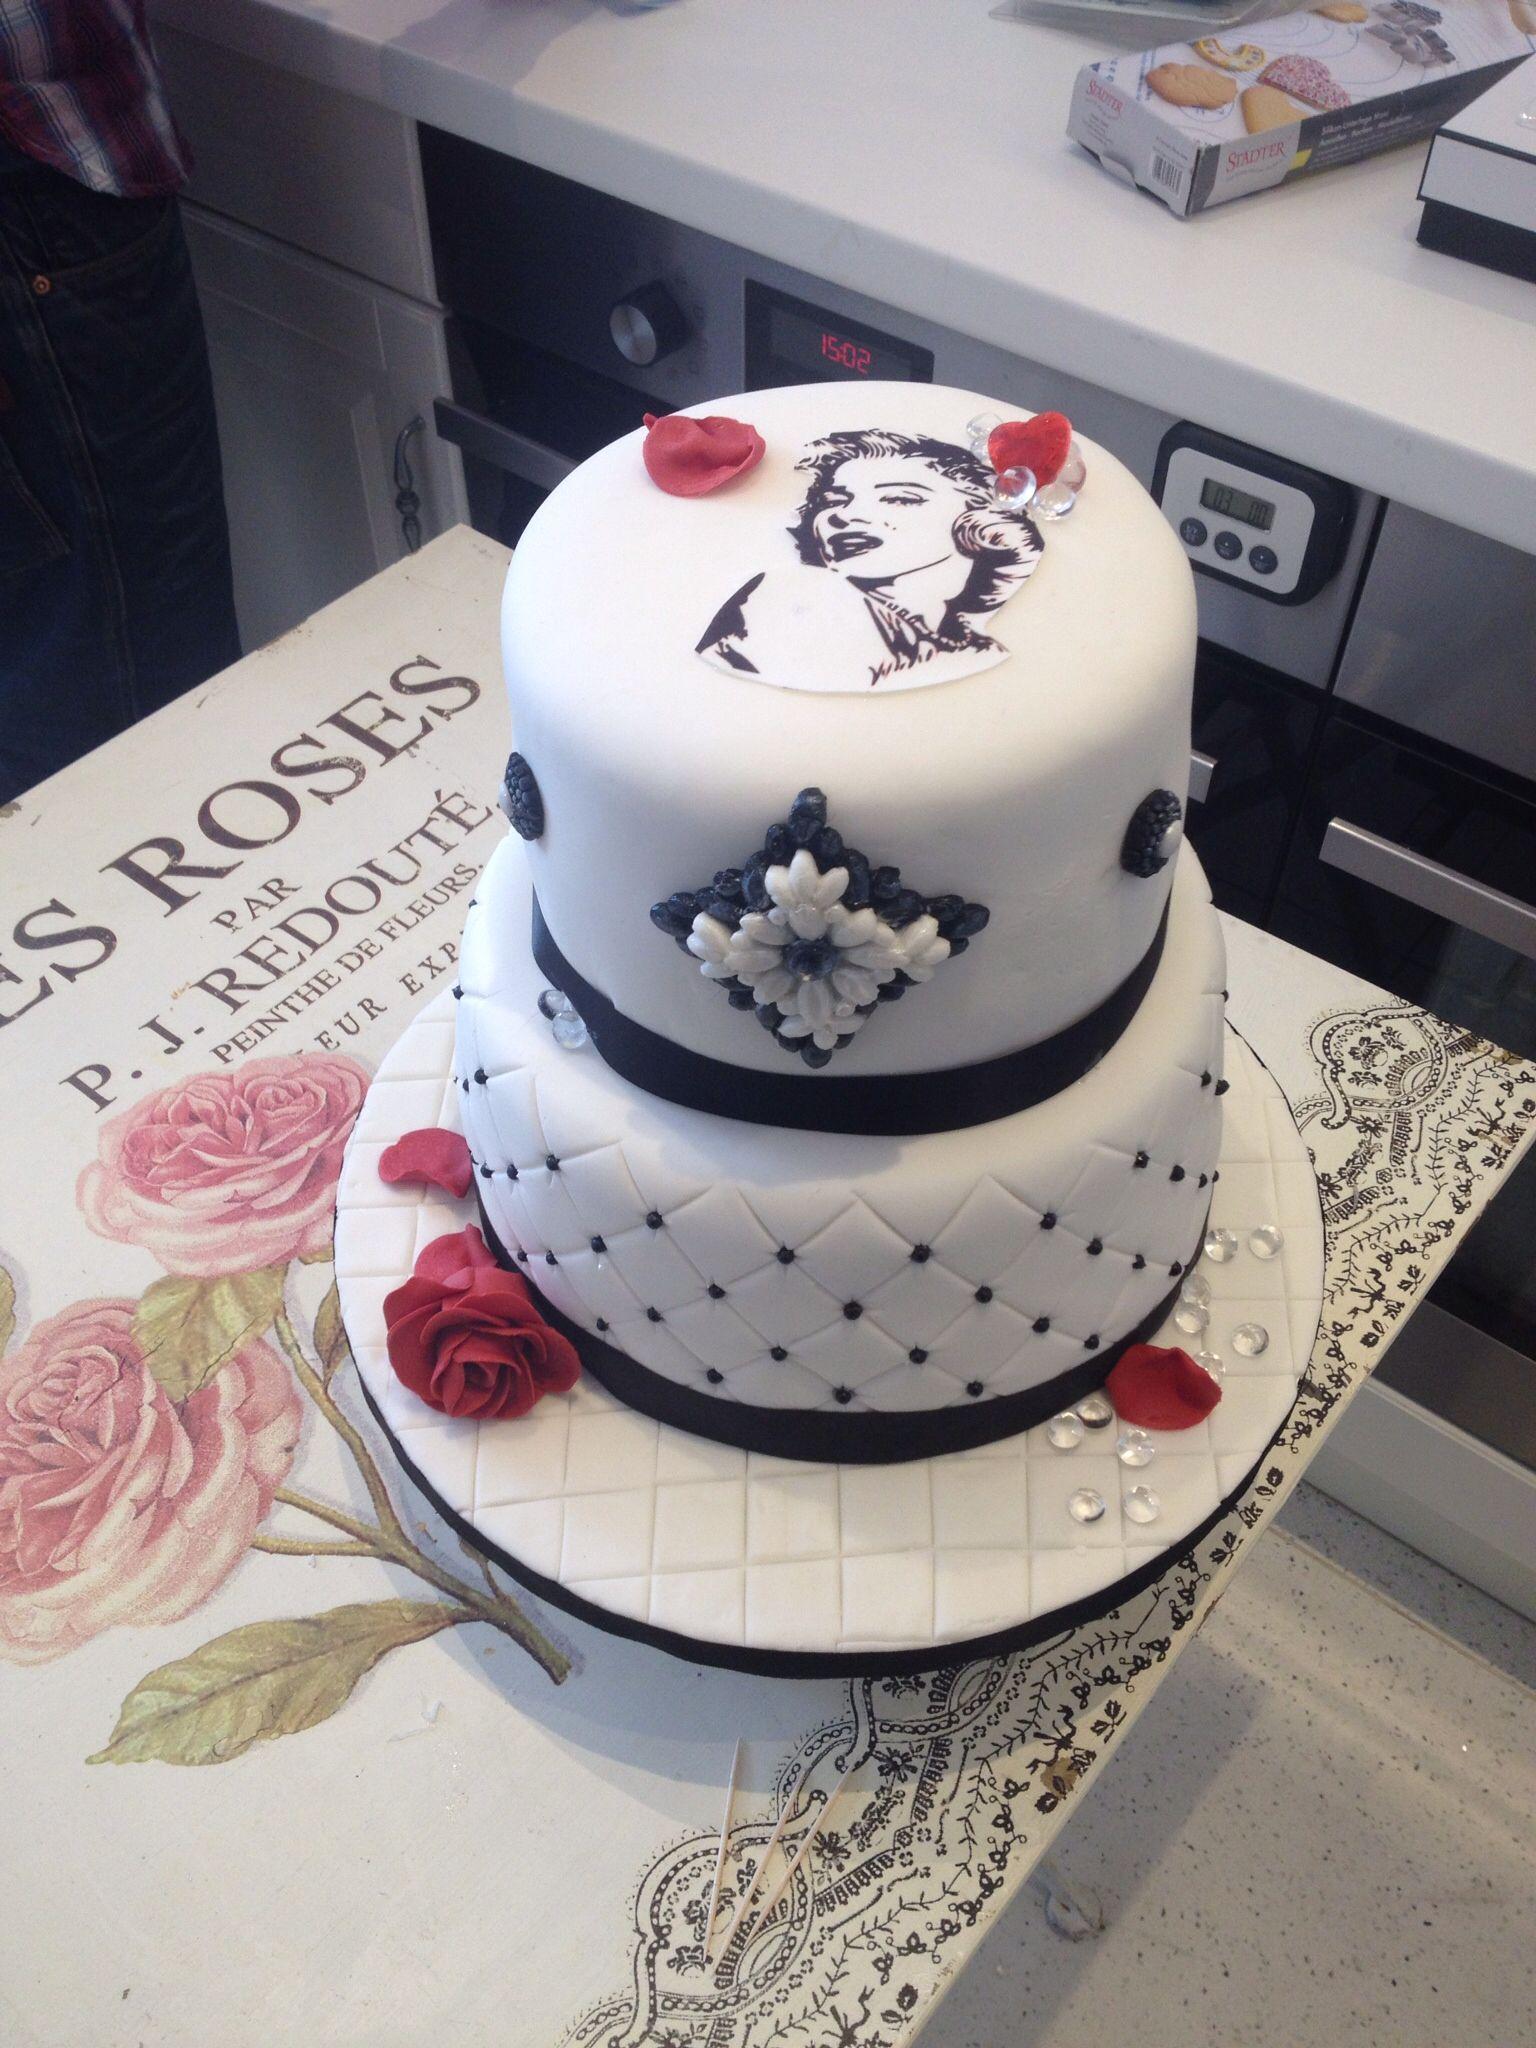 Marilyn monroe ornaments - Marilyn Monroe Cake On Black And White Sugarpaste